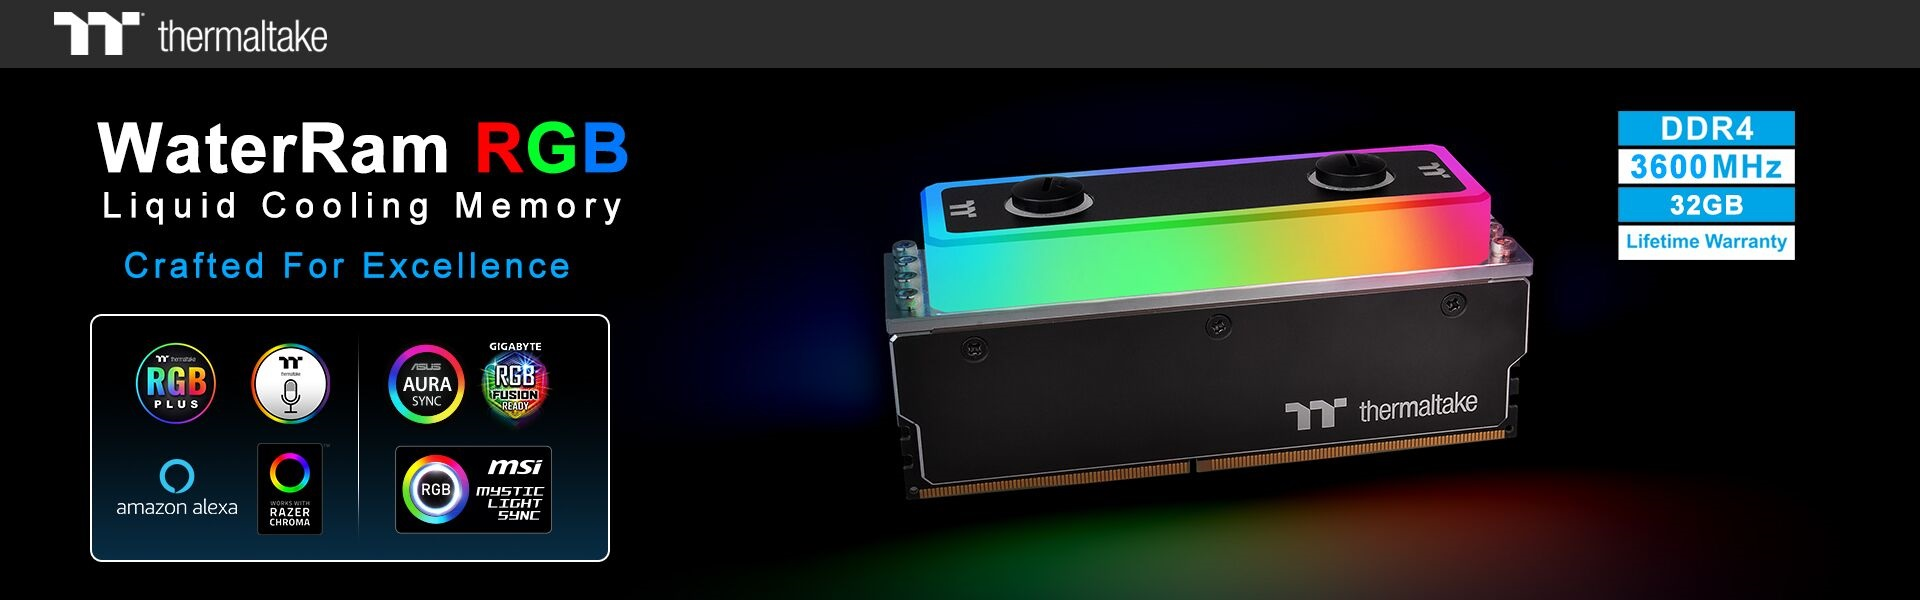 Thermaltake Presents WaterRAM RGB DDR4-3600MHz 32GB Memory Kit